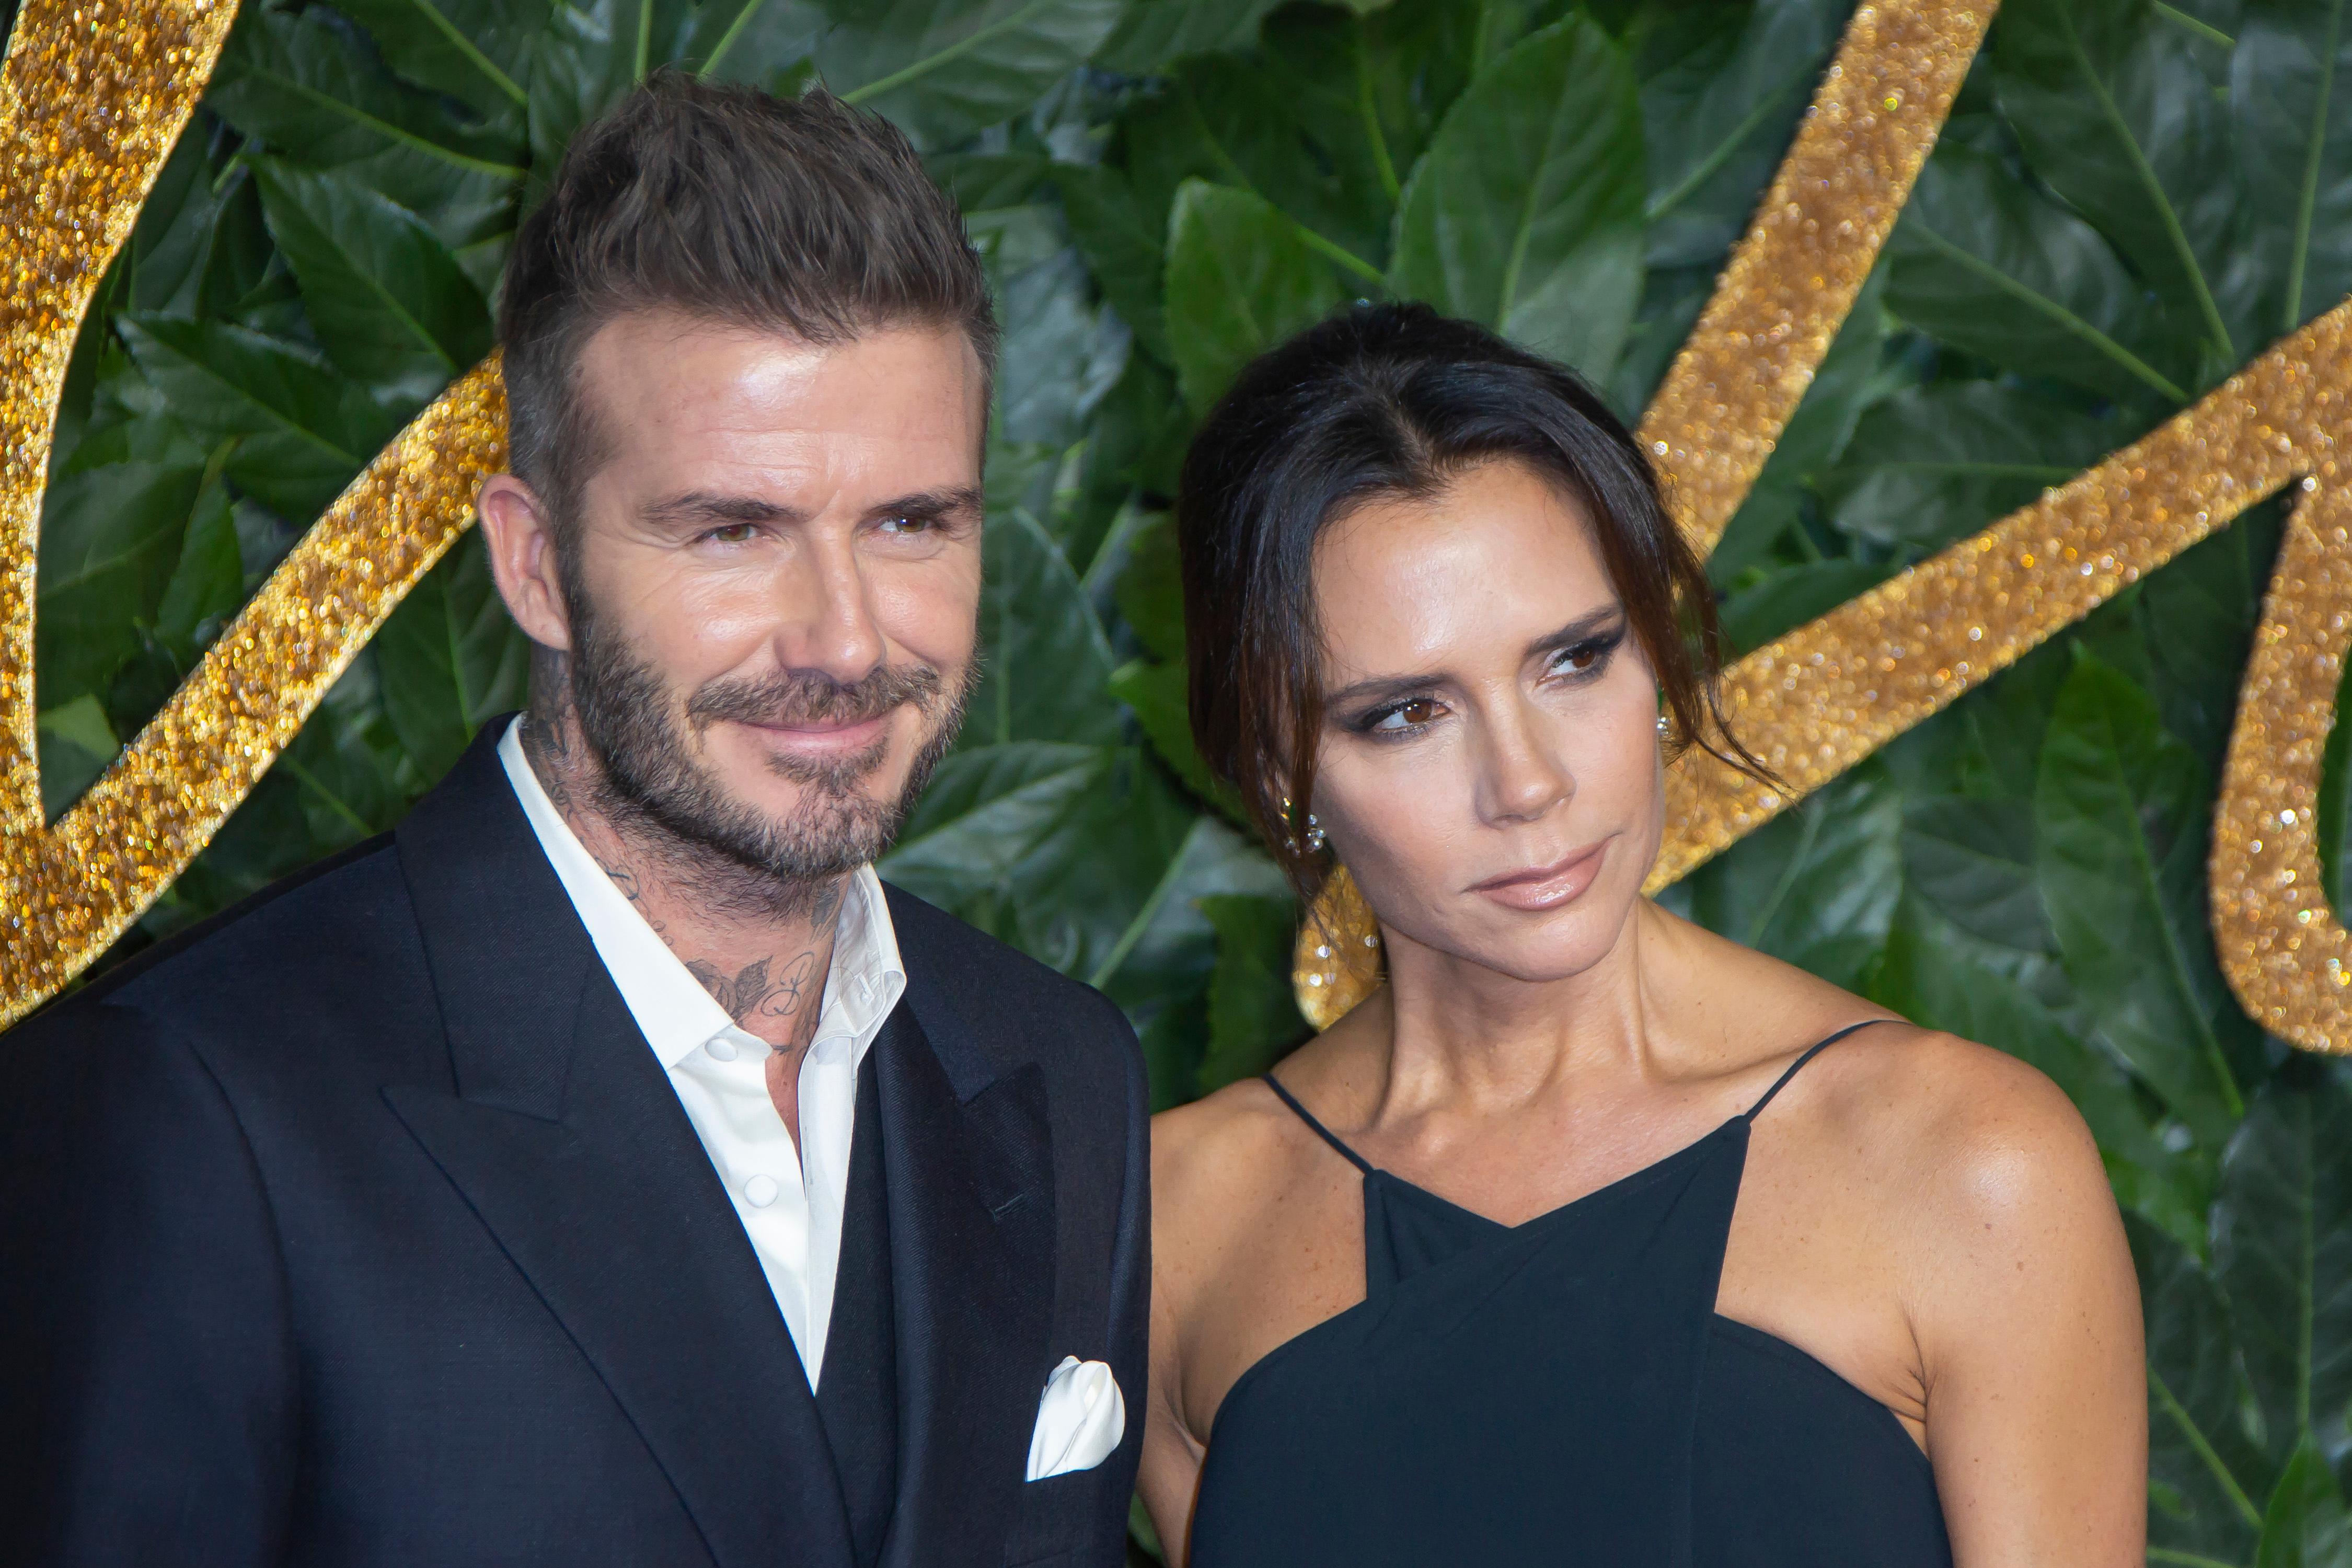 David y Victoria Beckham  La pareja que brilló en una noche de moda –  Prensa Libre 83b26884e70